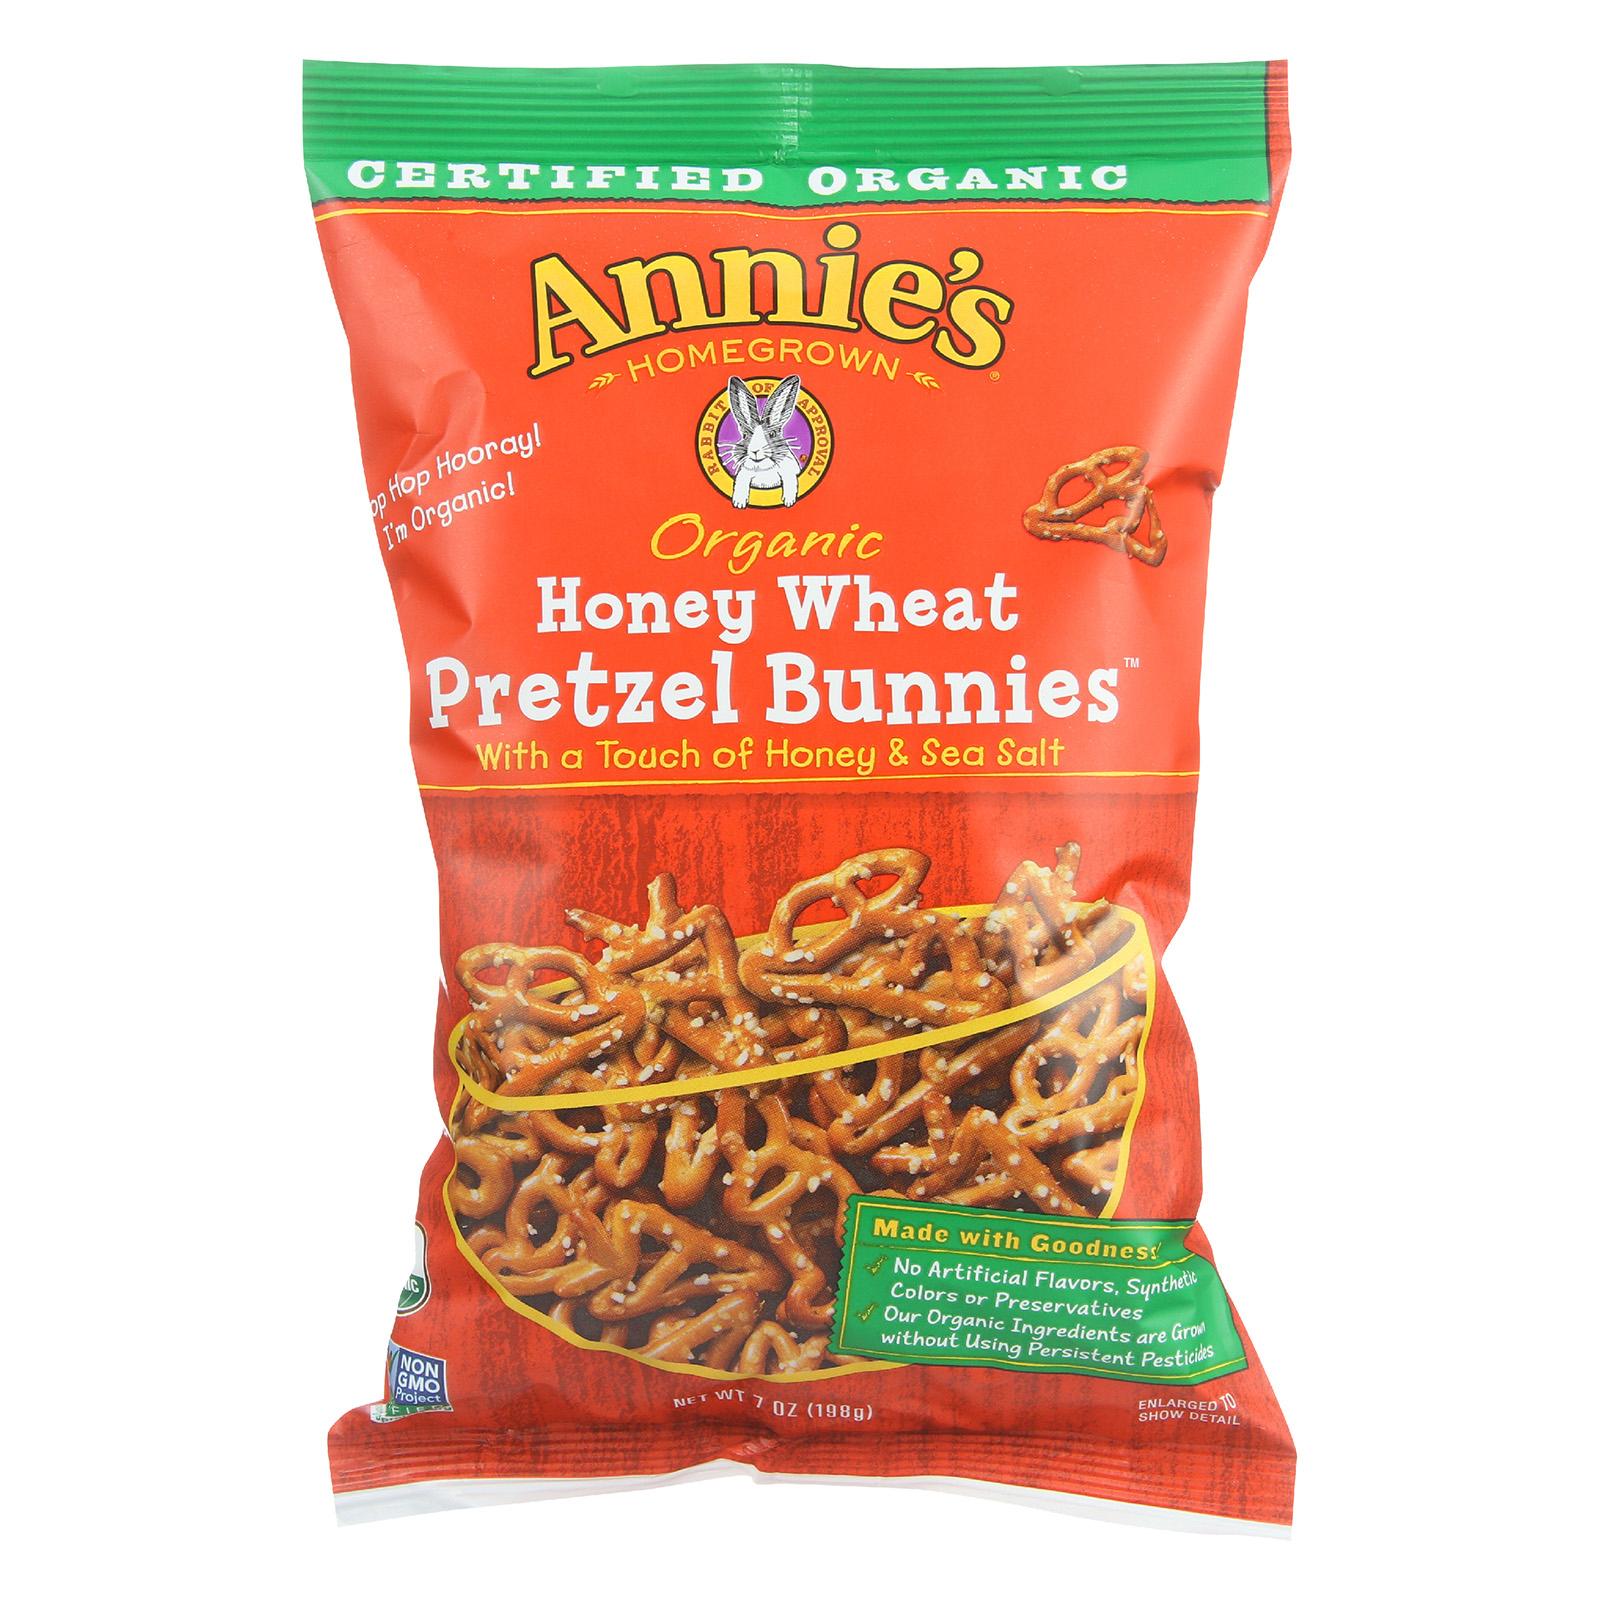 Annie's Homegrown Organic Honey Wheat Pretzel Bunnies - Case of 12 - 7 oz.